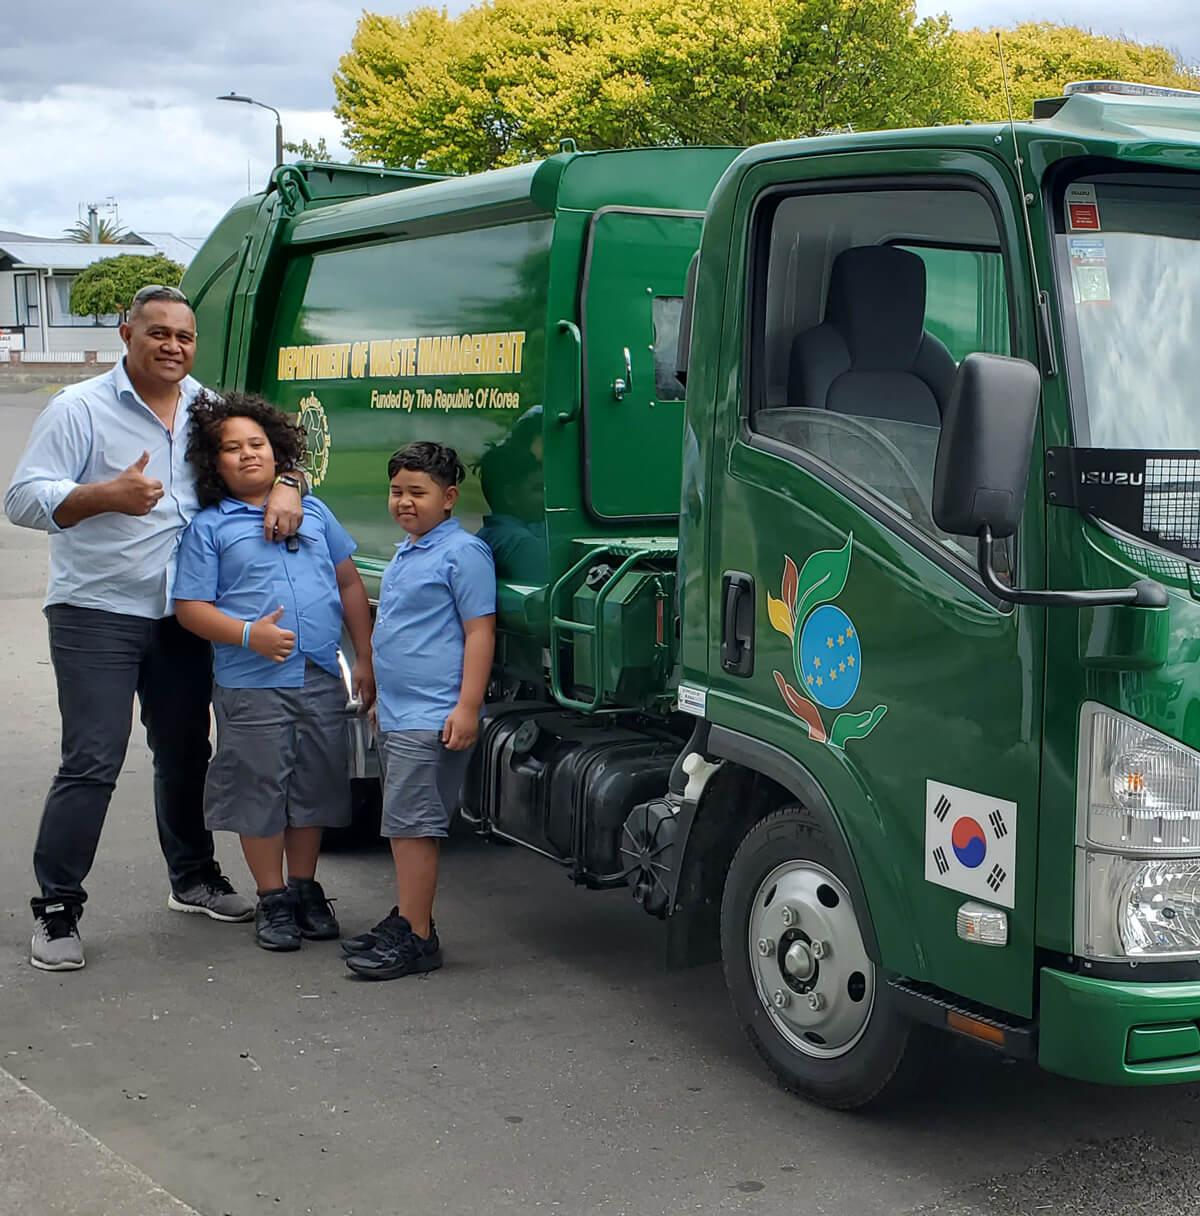 Dump truck Procured for Tuvalu of Waste management